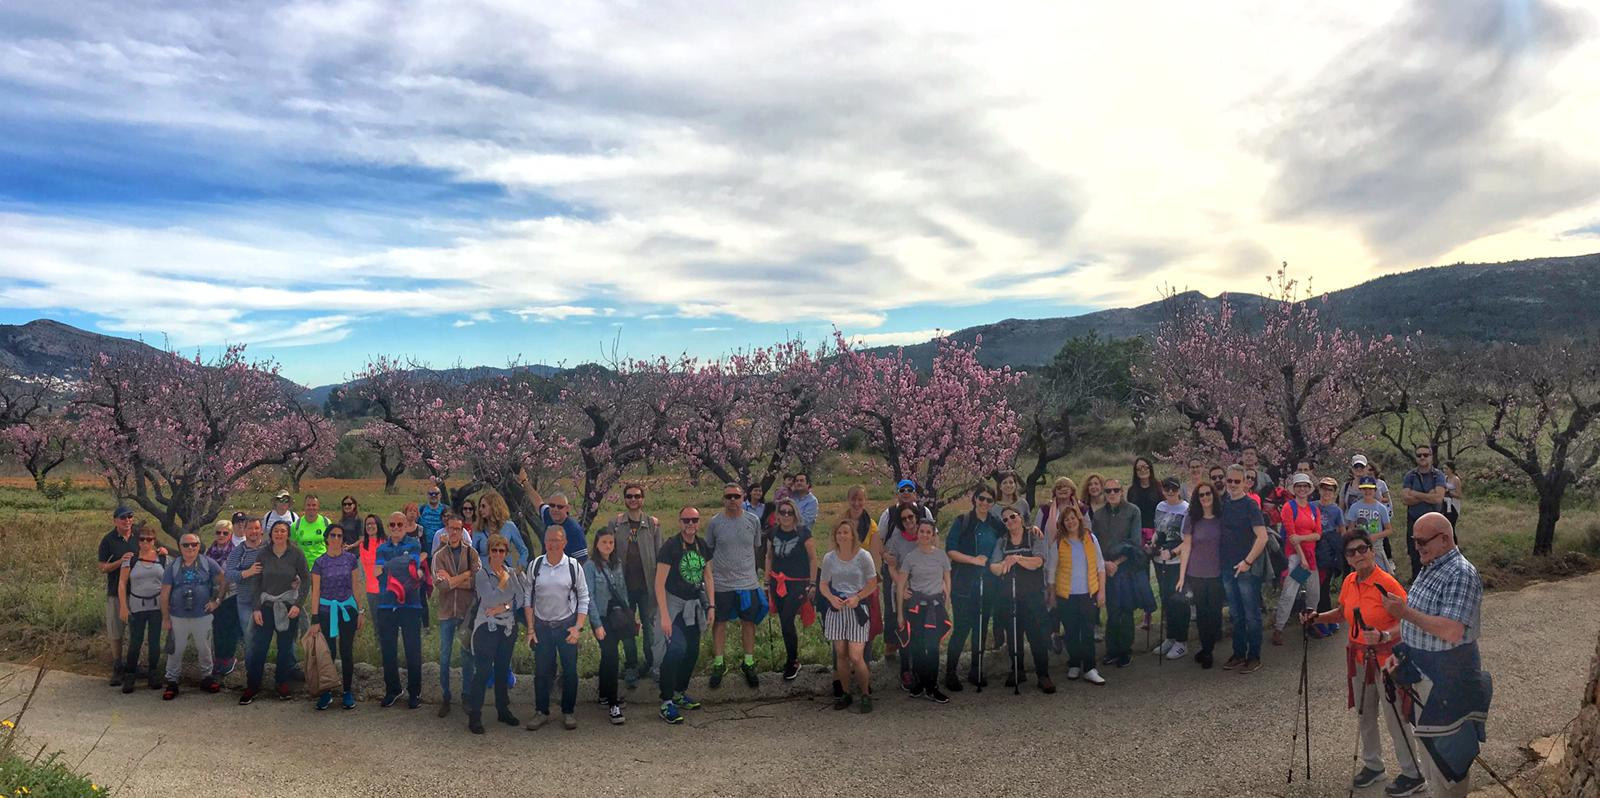 Rutas senderistas – Feslalí Alcalalí en flor